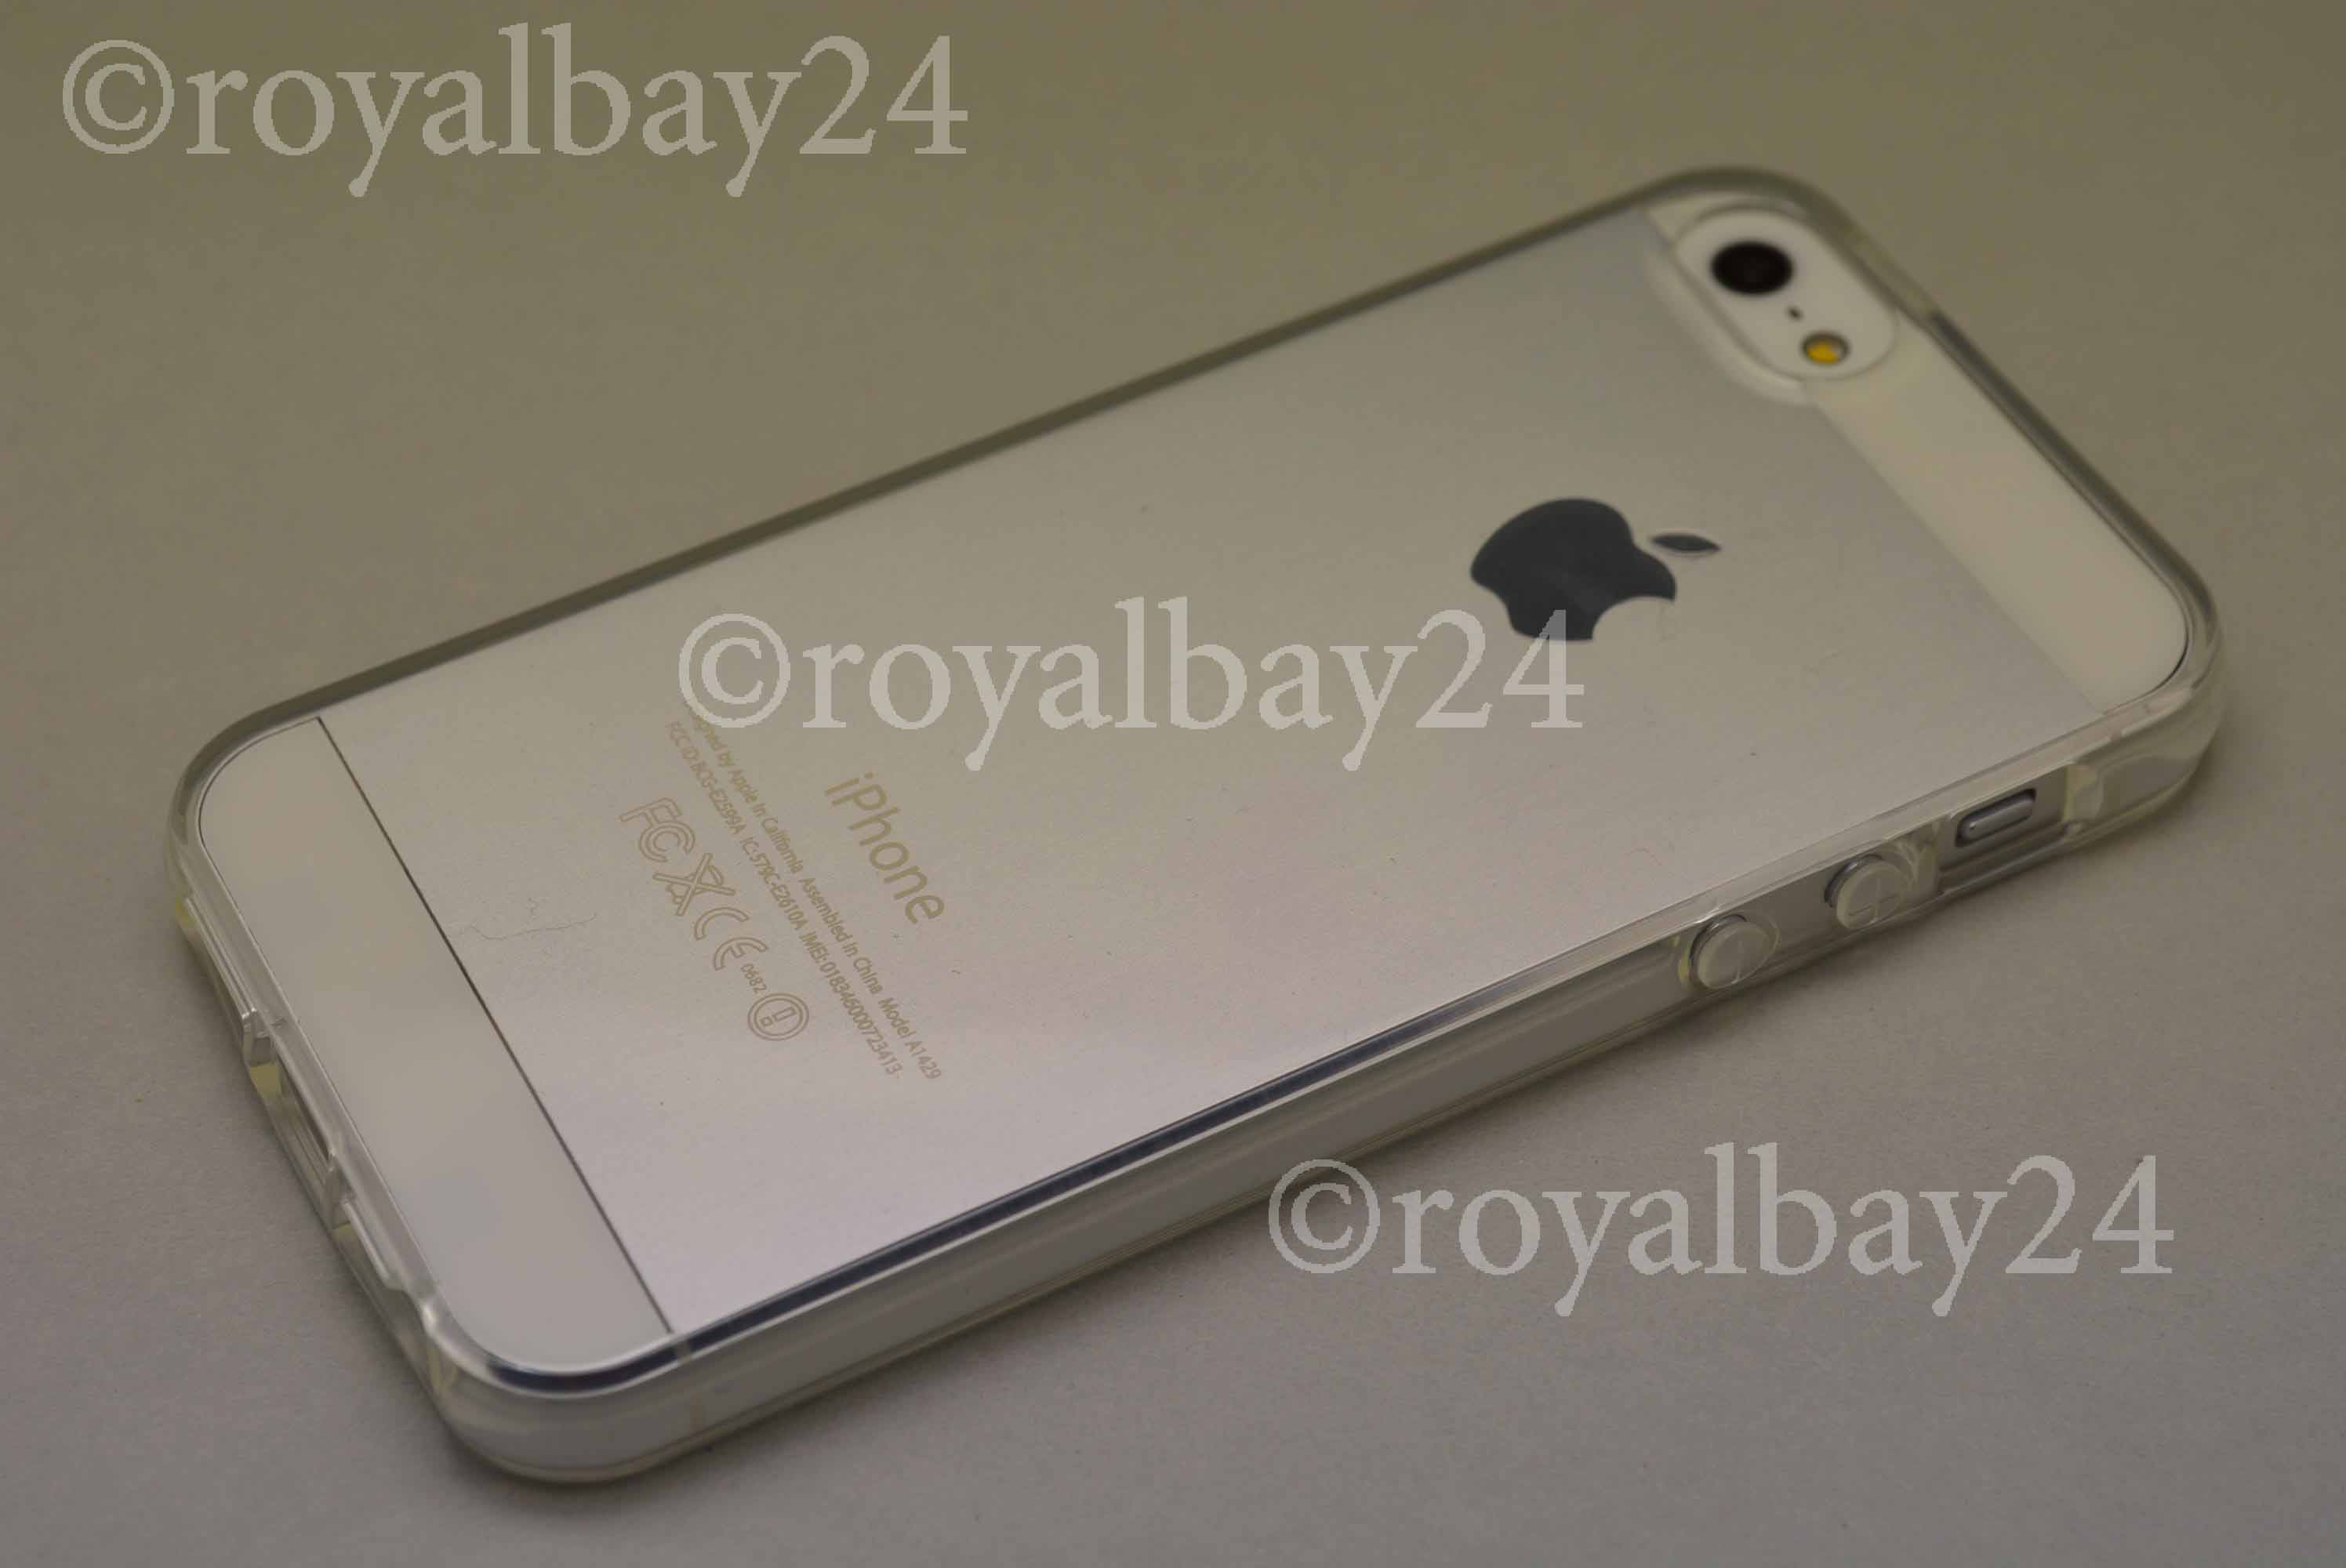 apple iphone 5s silikon bumper transparent schutz h lle. Black Bedroom Furniture Sets. Home Design Ideas